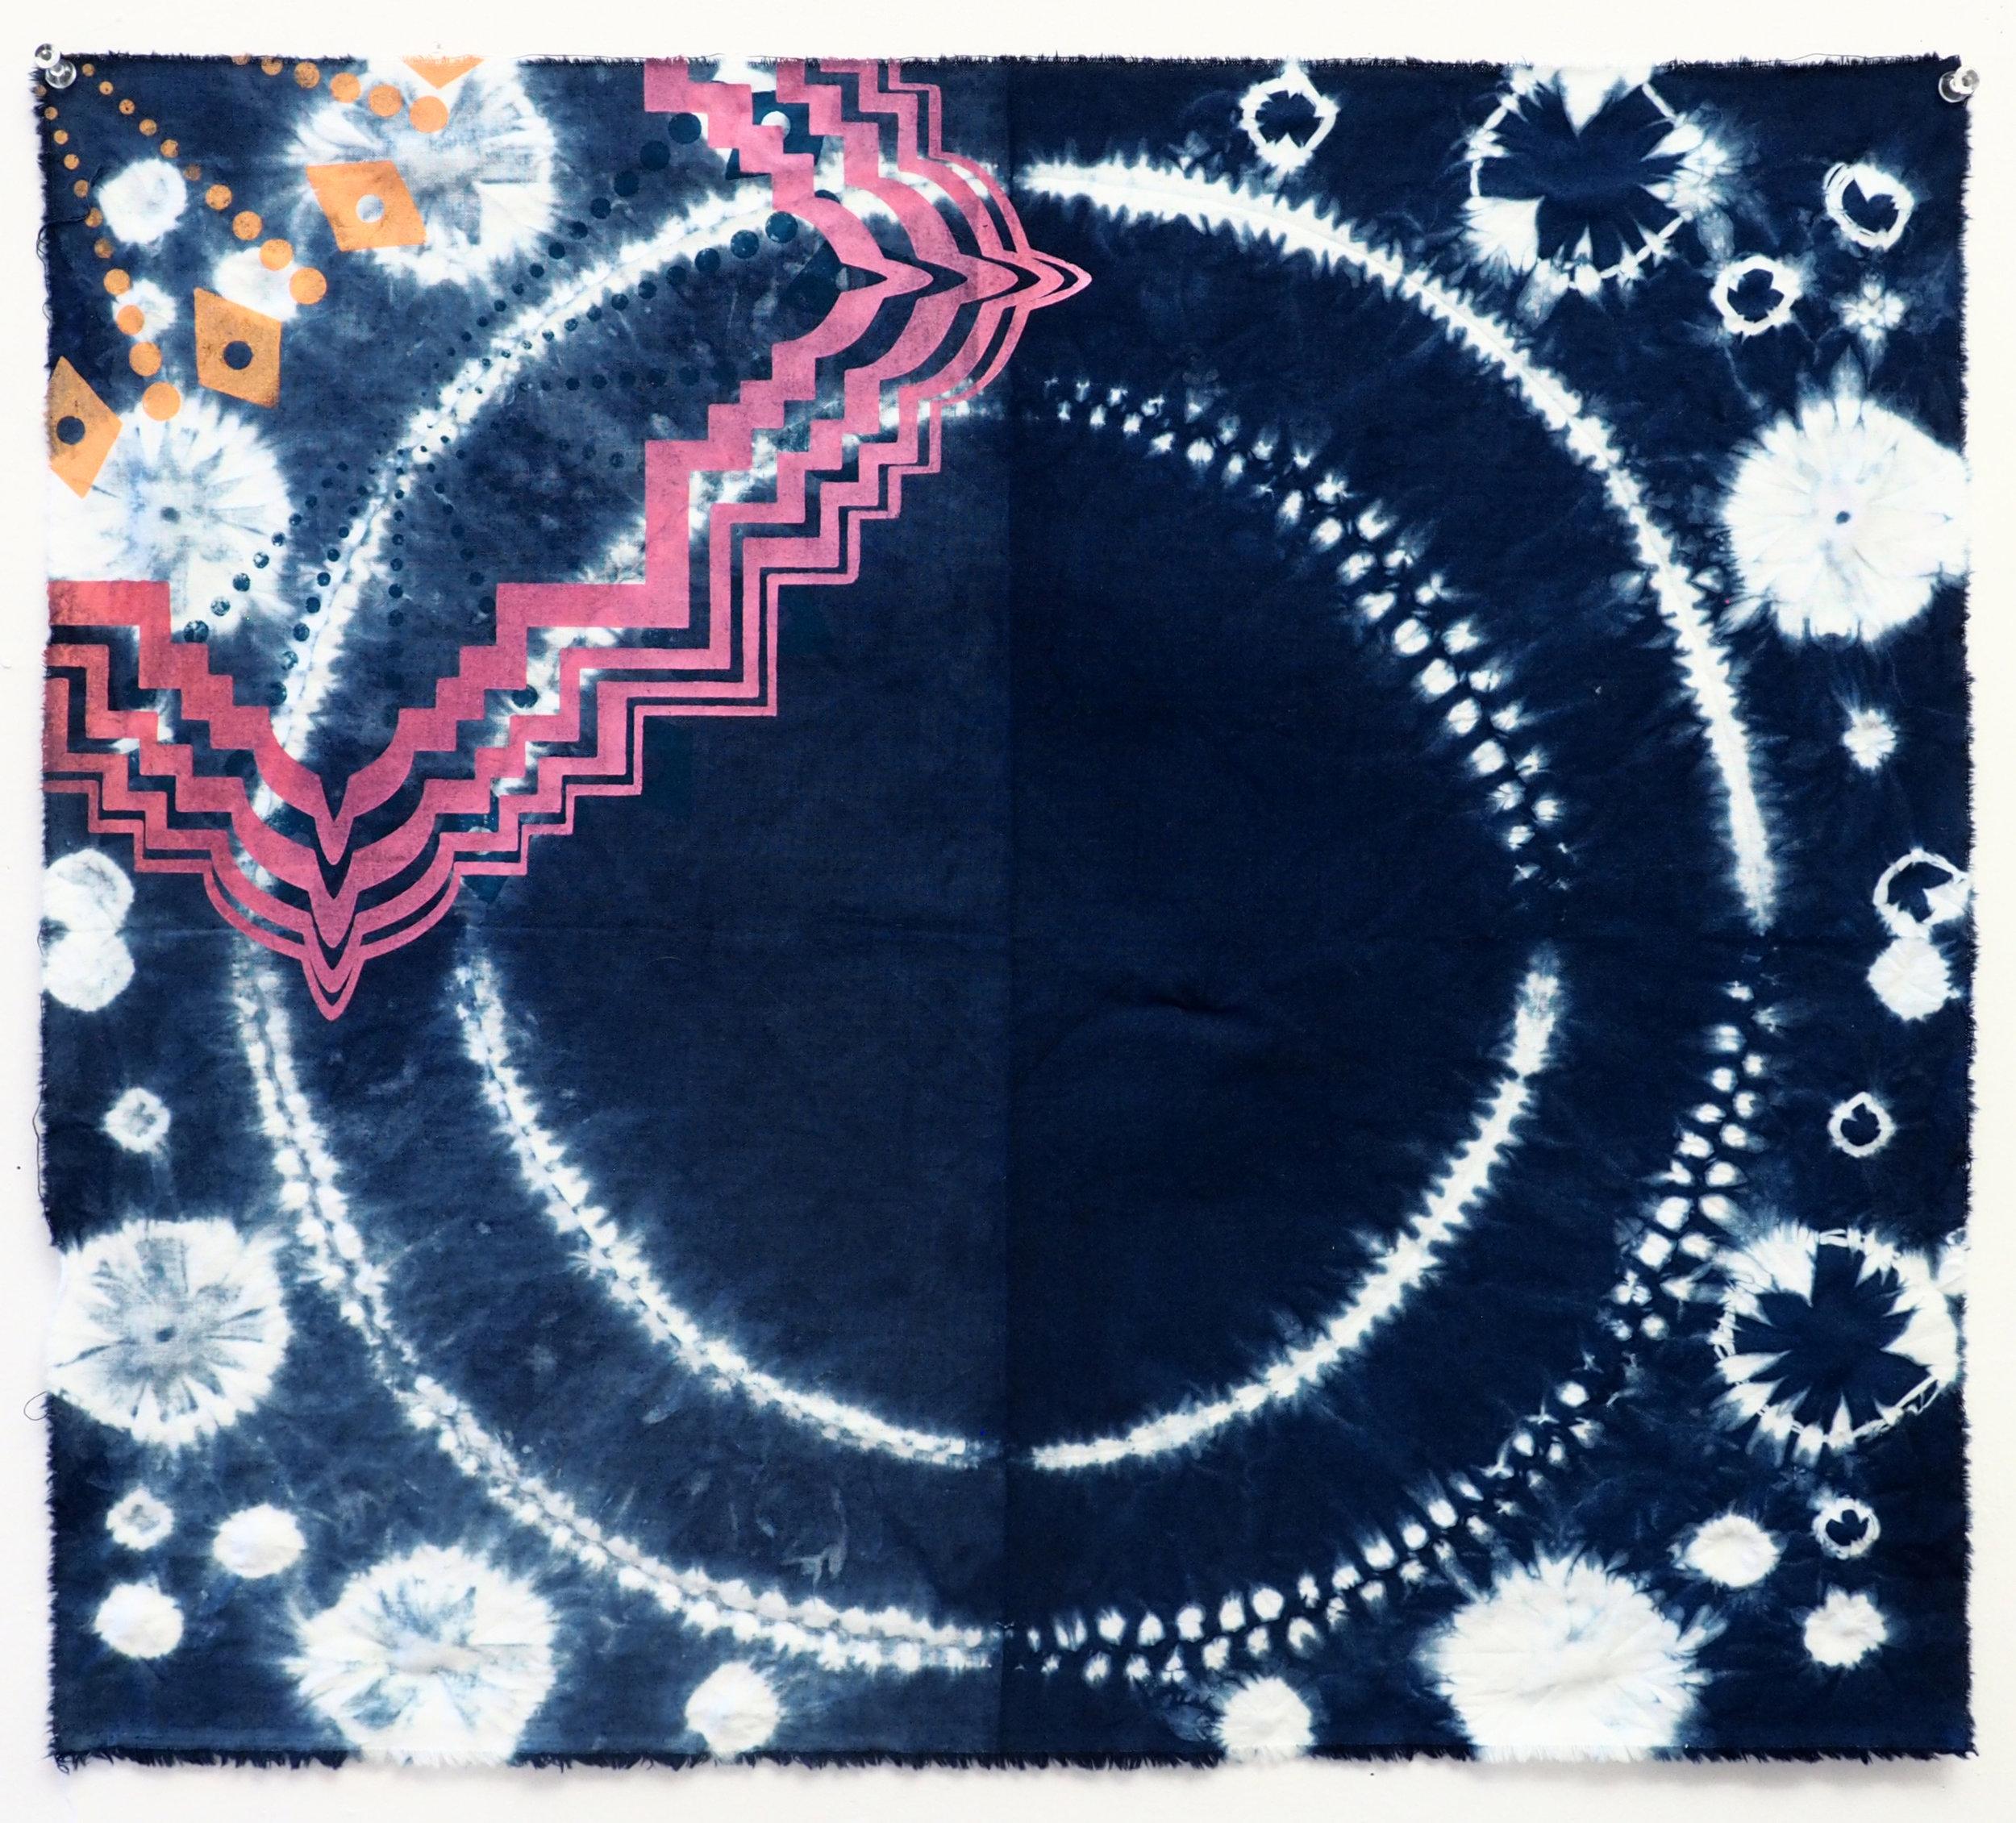 Indigo shibori and screenprint on cotton 21 x 19 in 2017